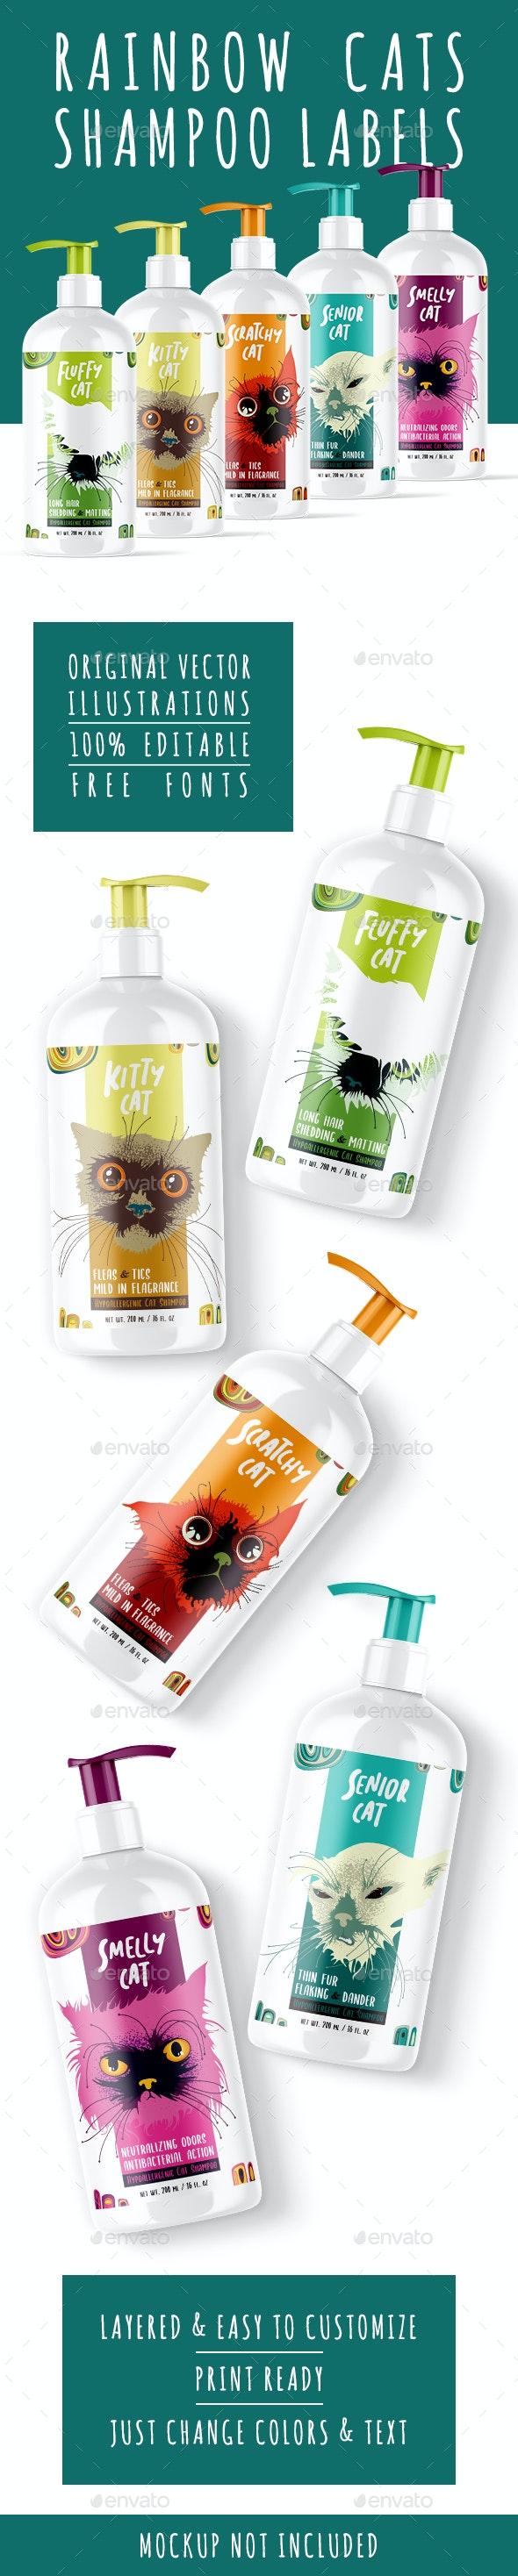 Cat Shampoo Labels